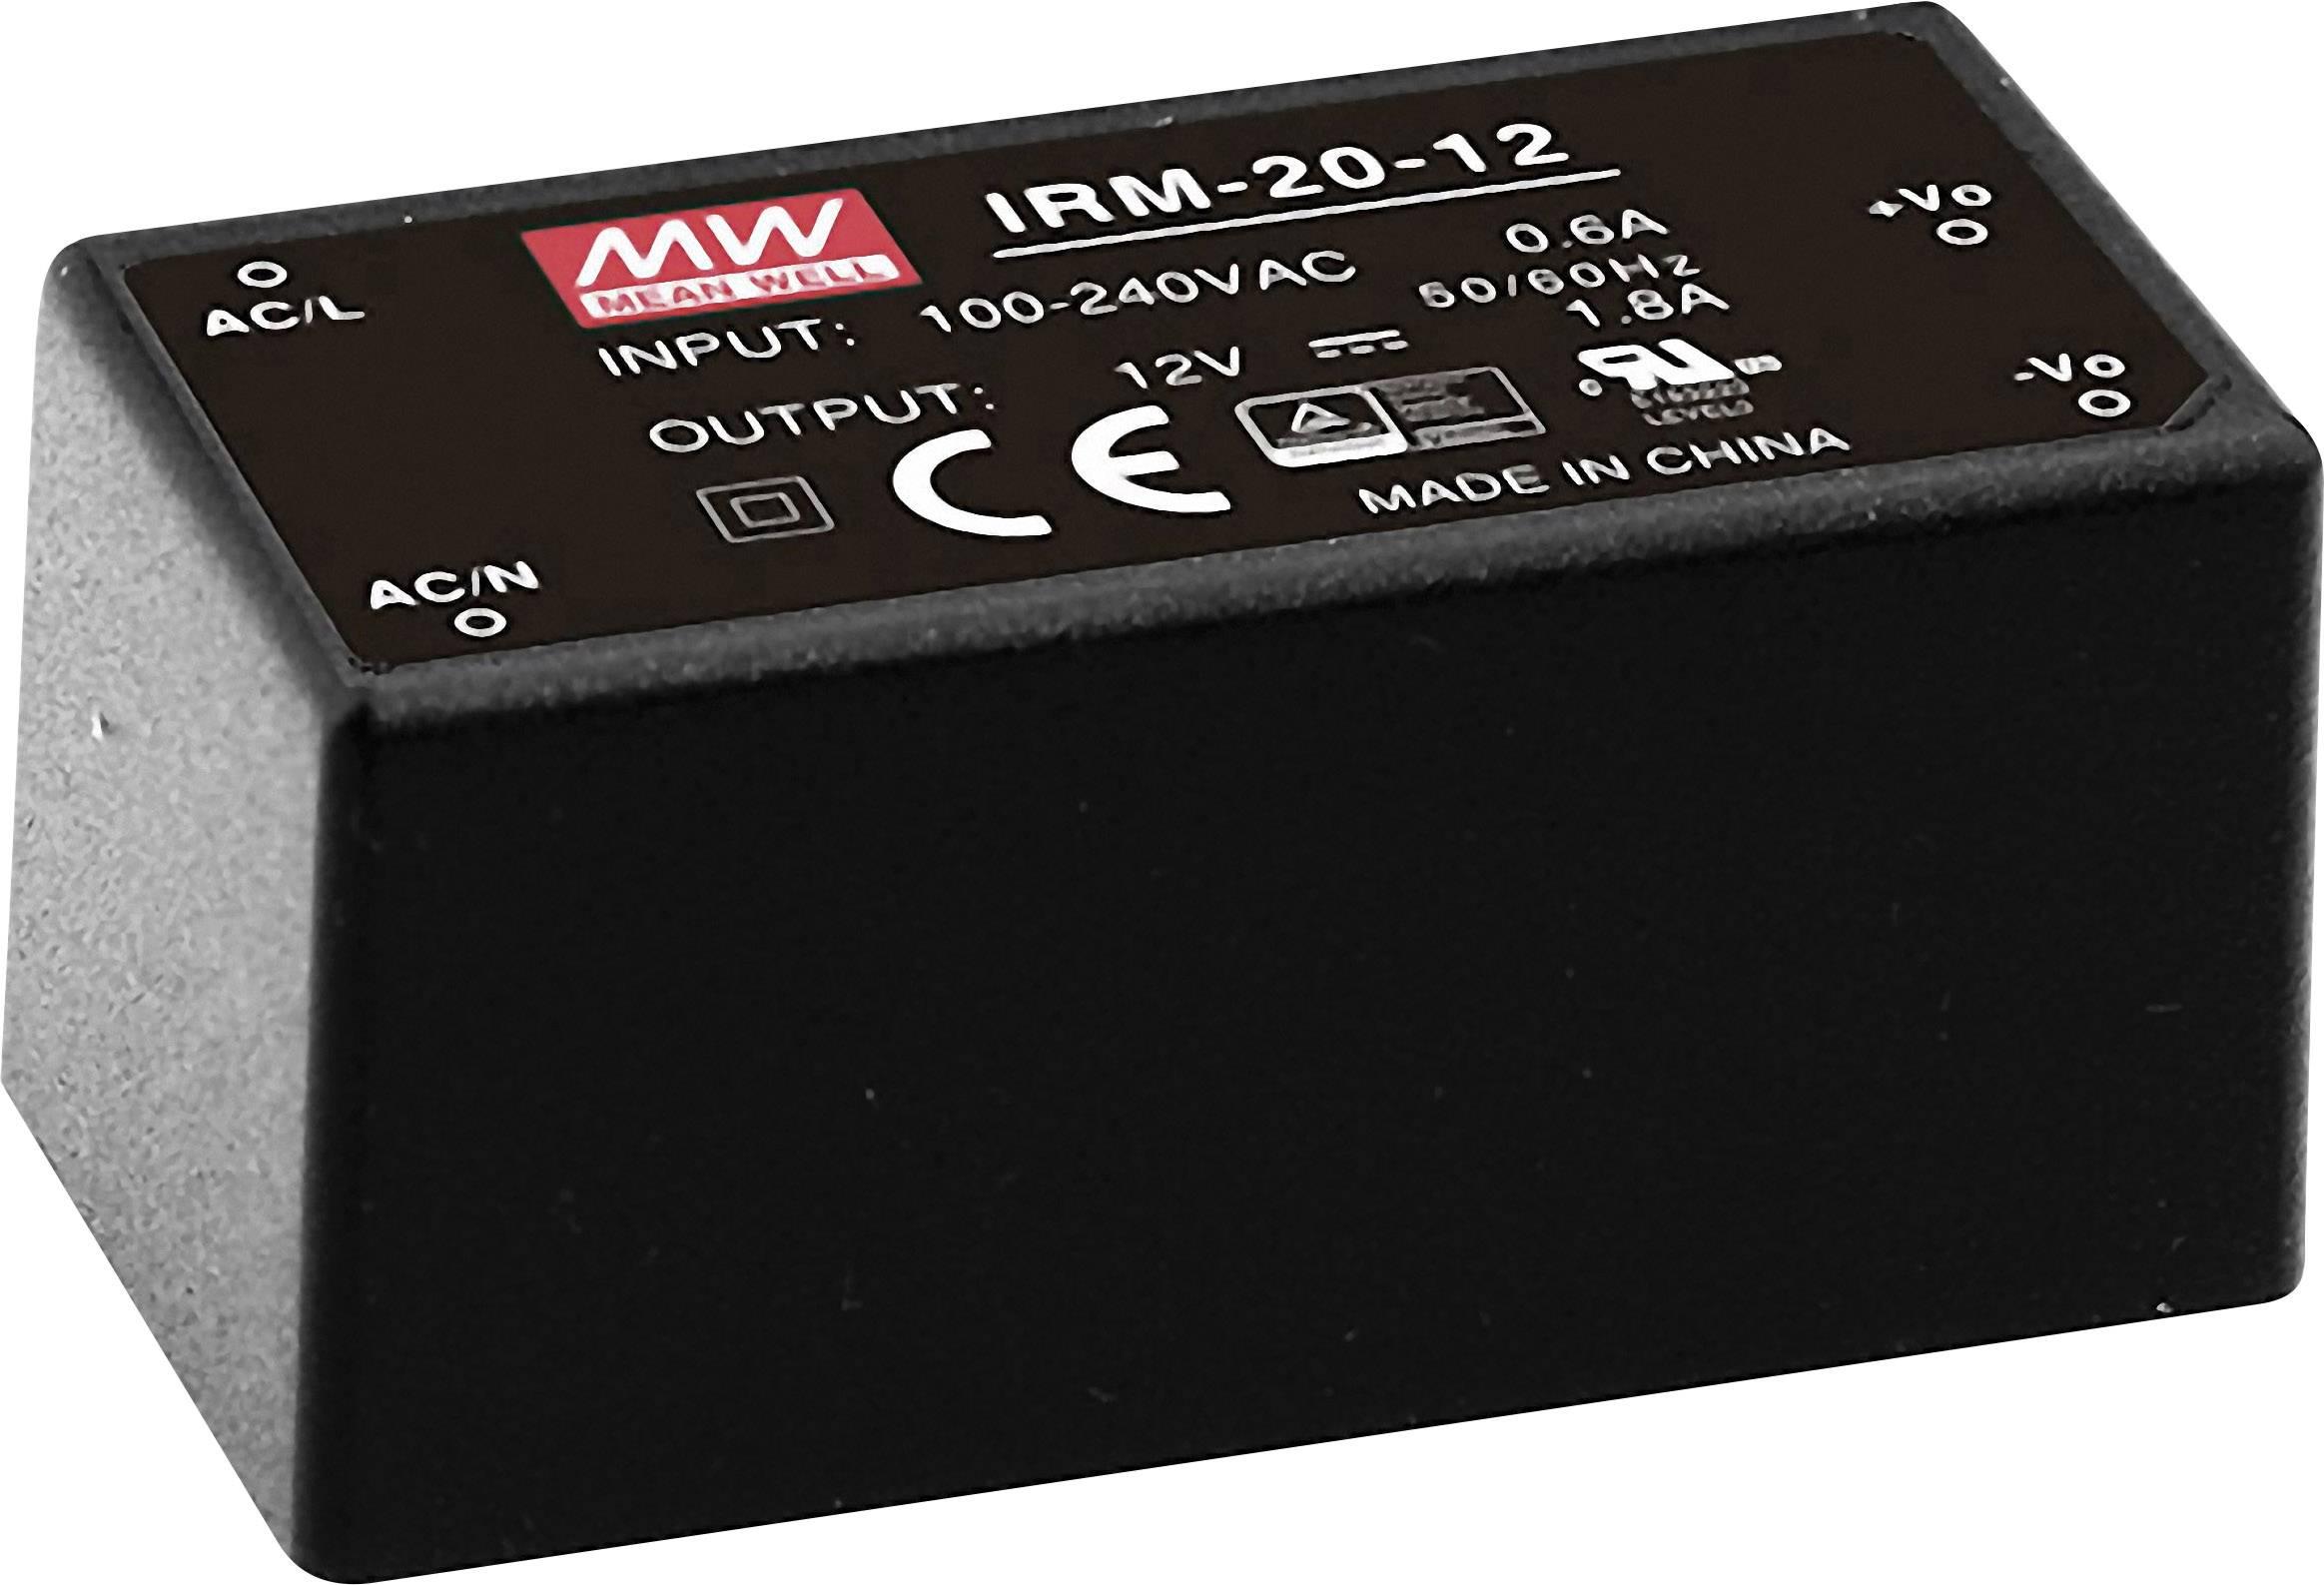 AC/DC zdroj do DPS Mean Well IRM-20-12, 12 V/DC, 1.8 A, 21.6 W